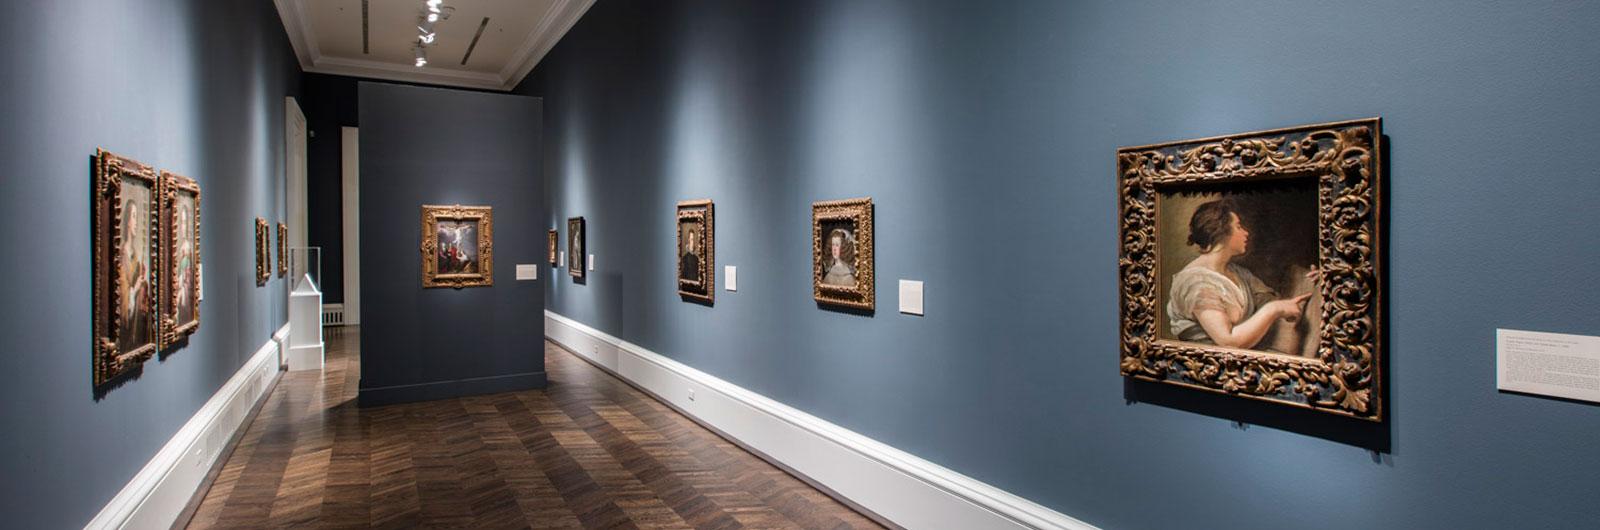 The Algur H. Meadows Collection - Founding Collection